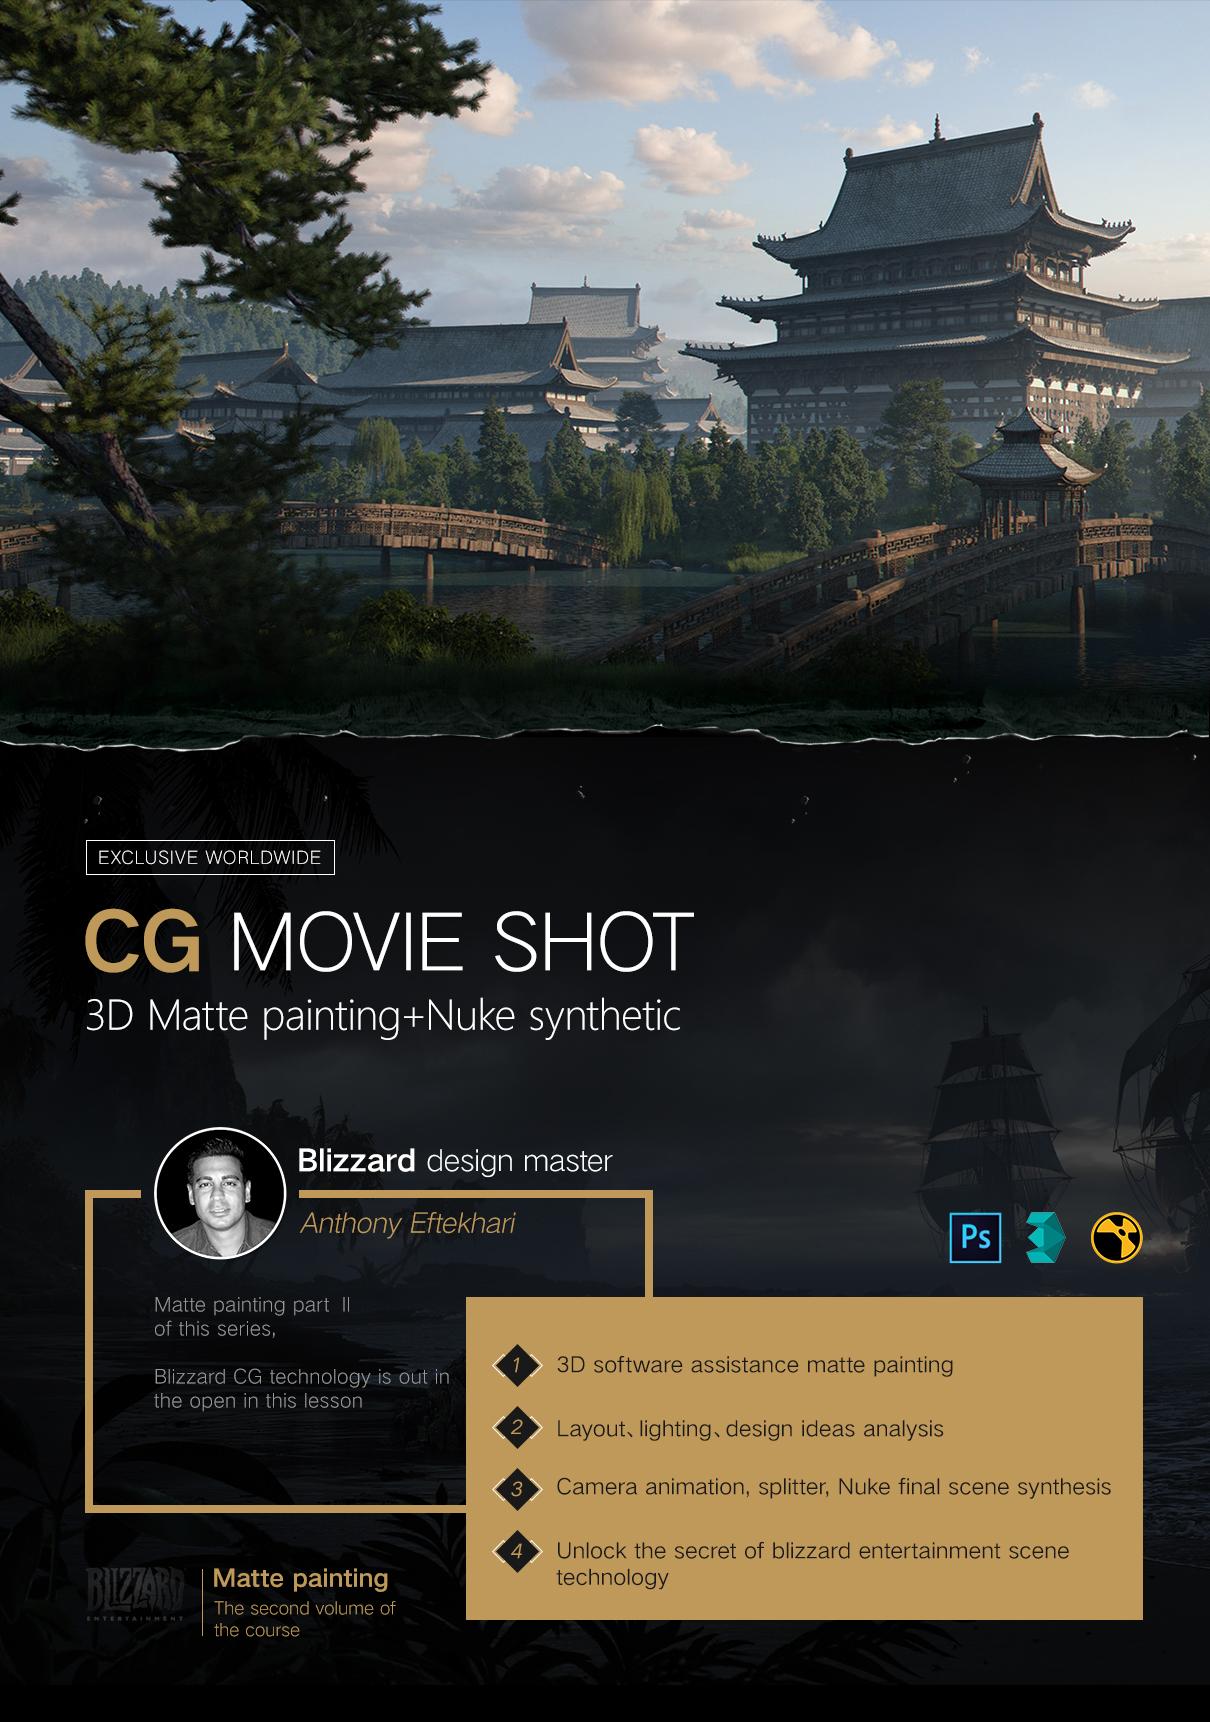 Blizzard compositing master《CG movie shot》视频教程_翼狐网